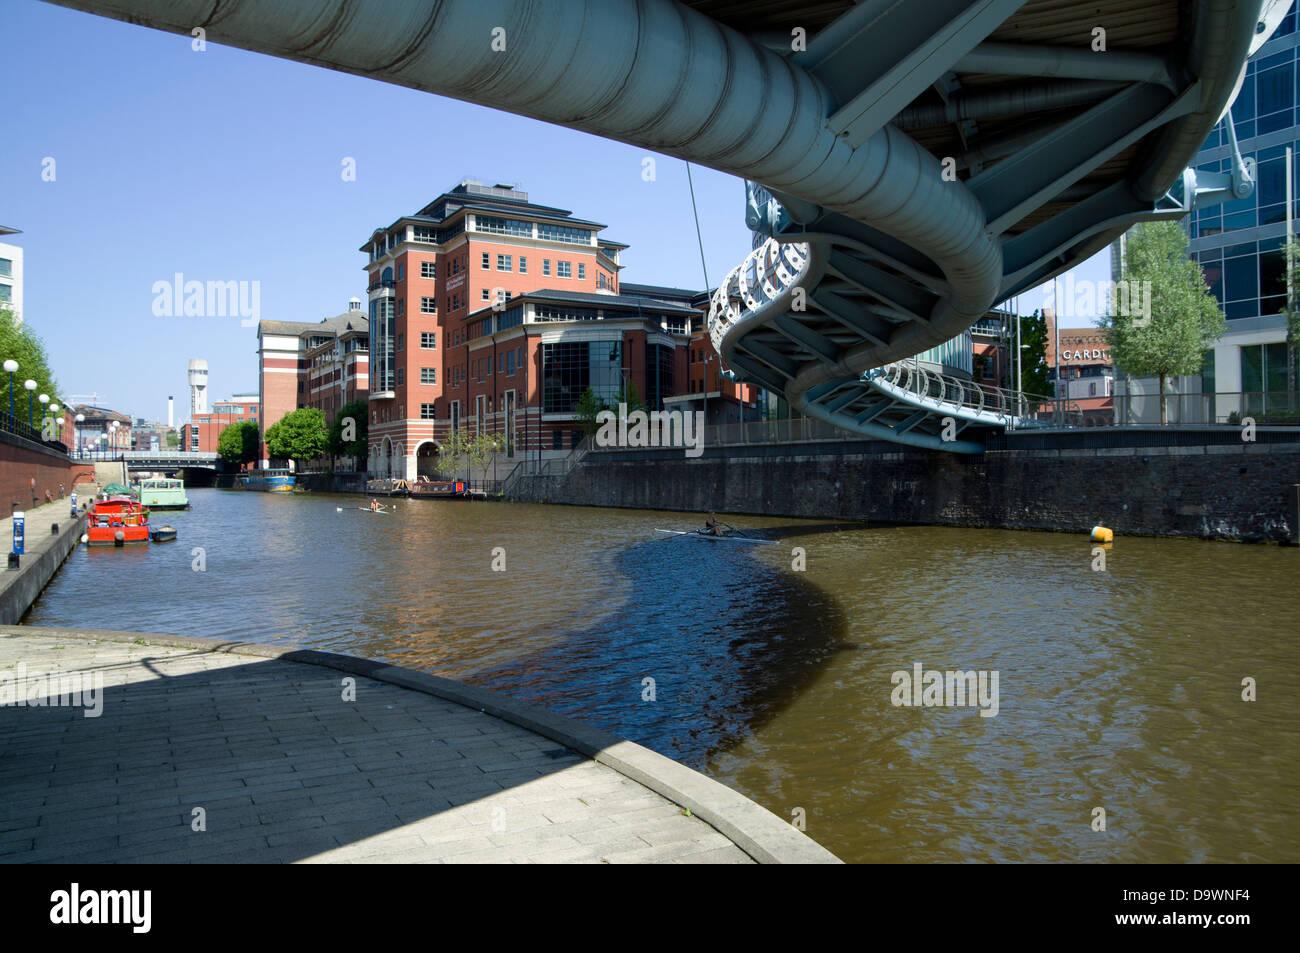 temple quay and river avon, bristol, england. - Stock Image